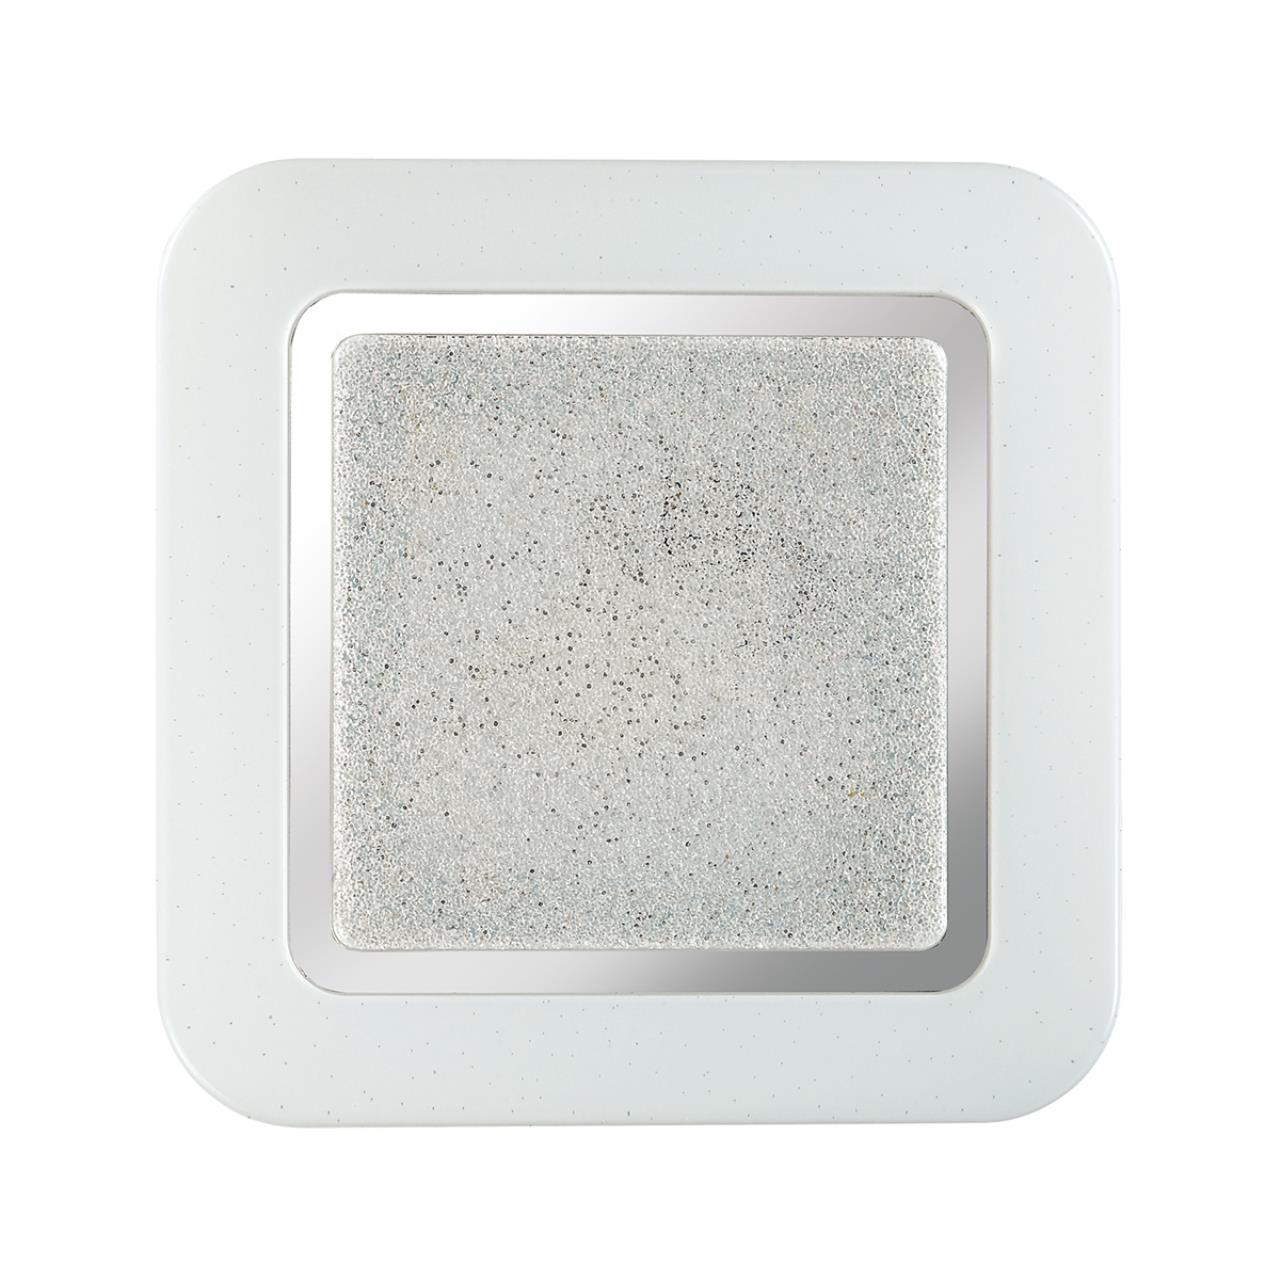 2080/EL SN 050 св-к PINO пластик LED 72Вт 3000-6000K 530*530 IP43 пульт ДУ